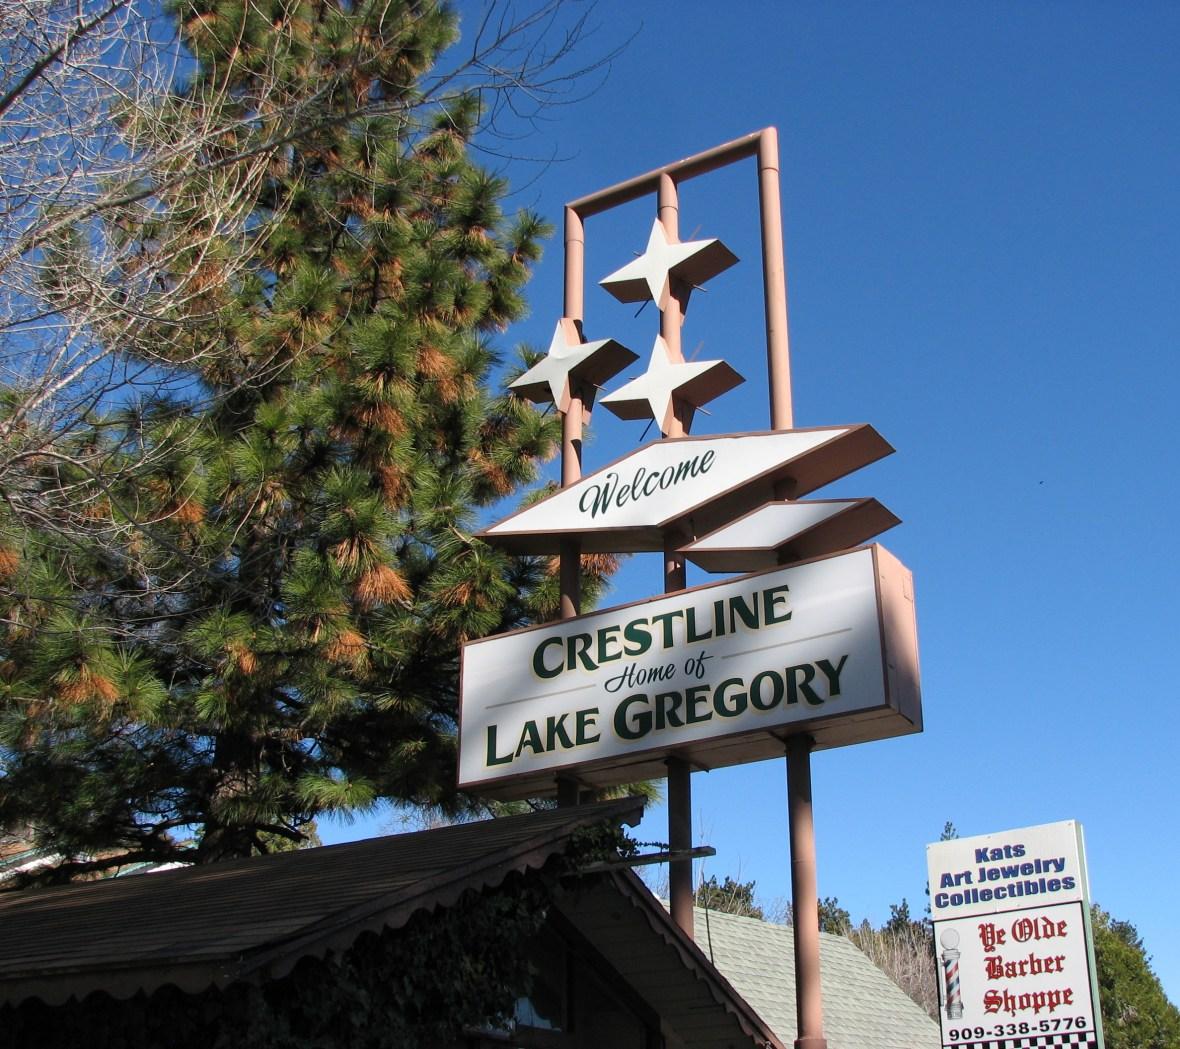 Googie-style sign - Crestline, California U.S.A. - December 25, 2015